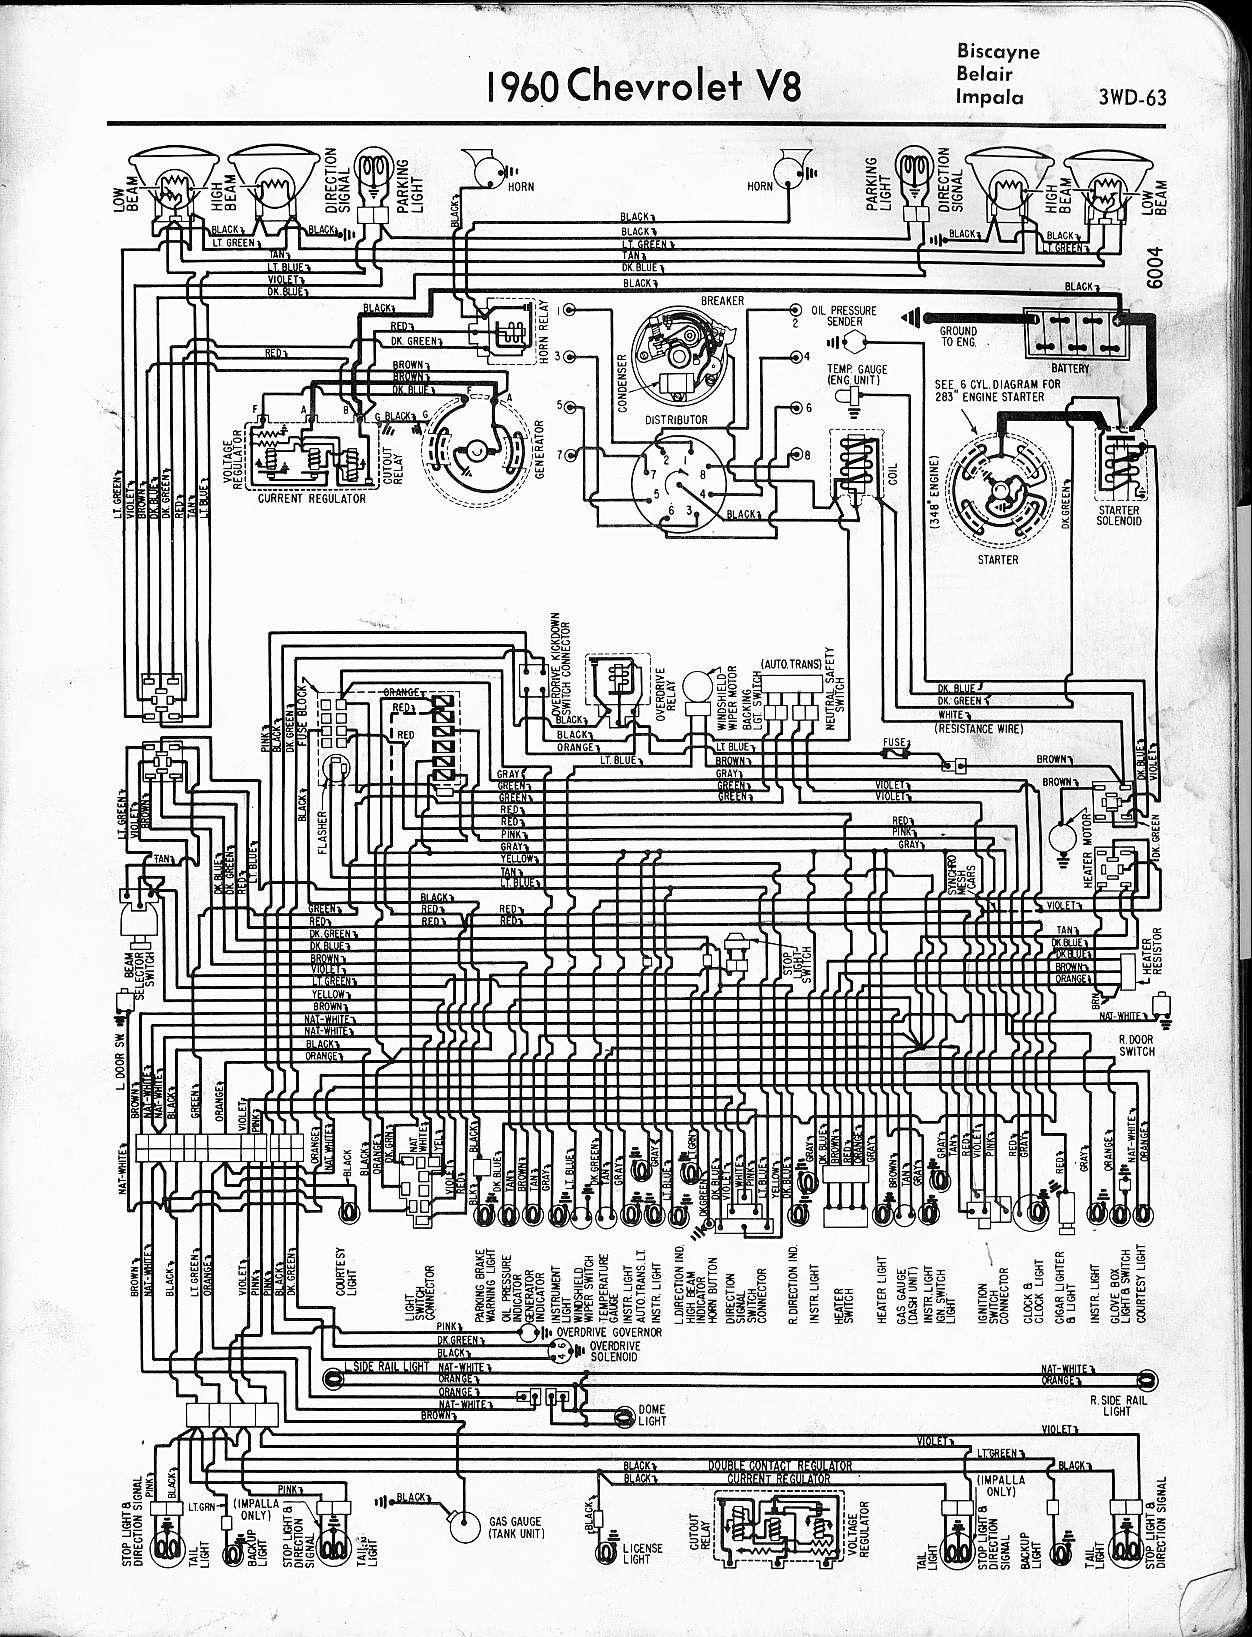 2001 Chevy Malibu 3 1 Engine Diagram In 2021 Chevy Impala Chevy Impala